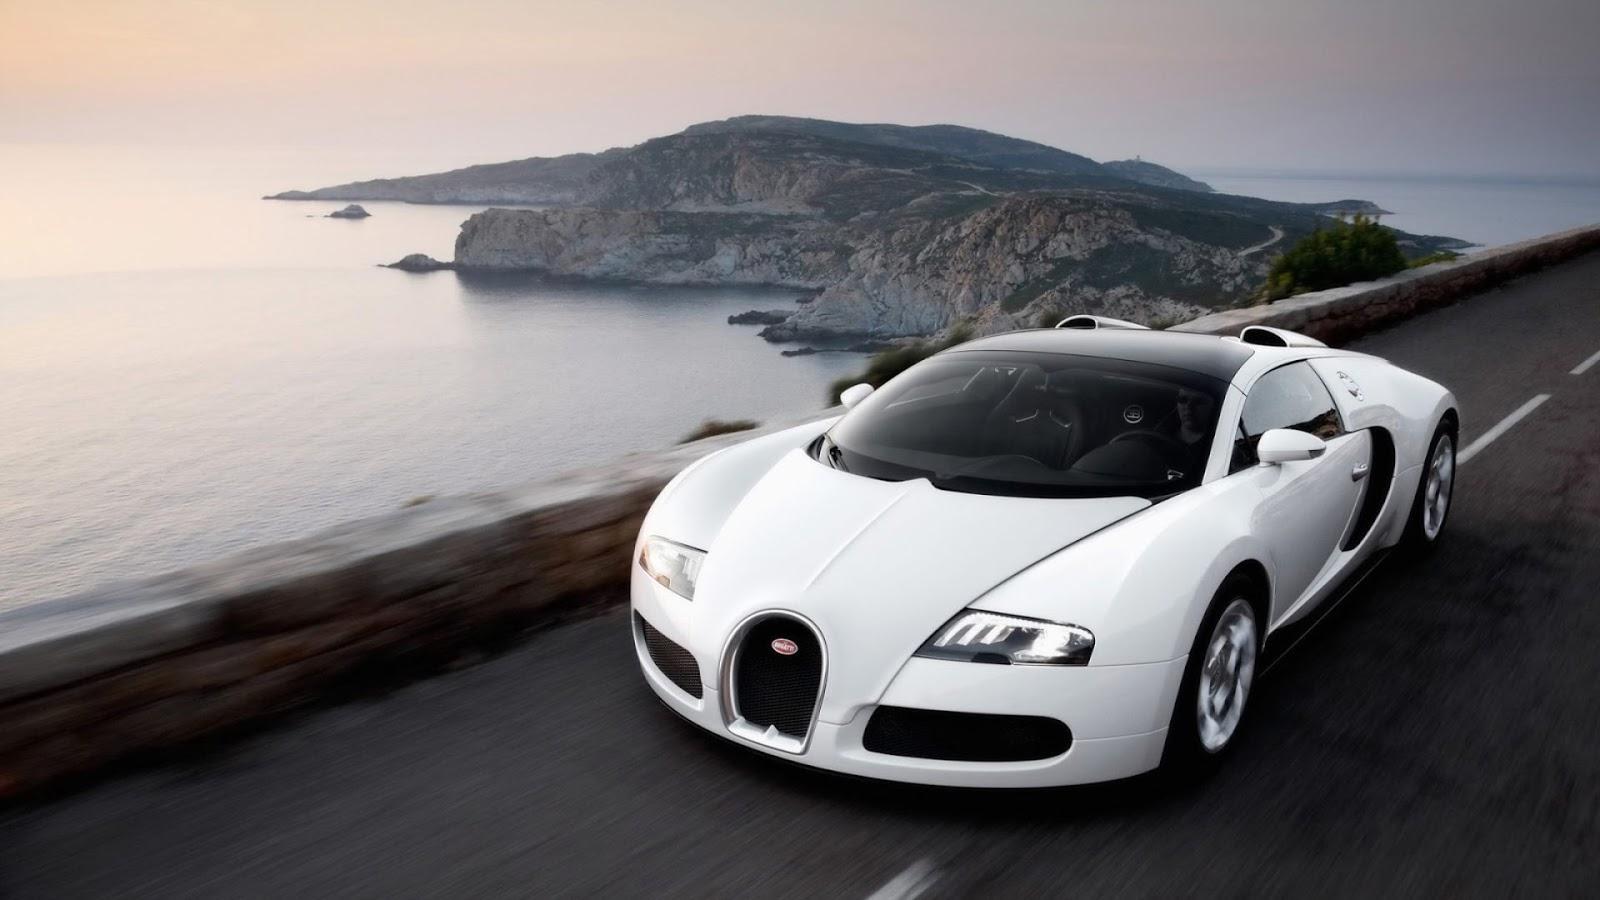 Sport Wallpaper Bugatti Veyron: Bugatti Veyron Sports Cars HD Wallpapers Download 1080p